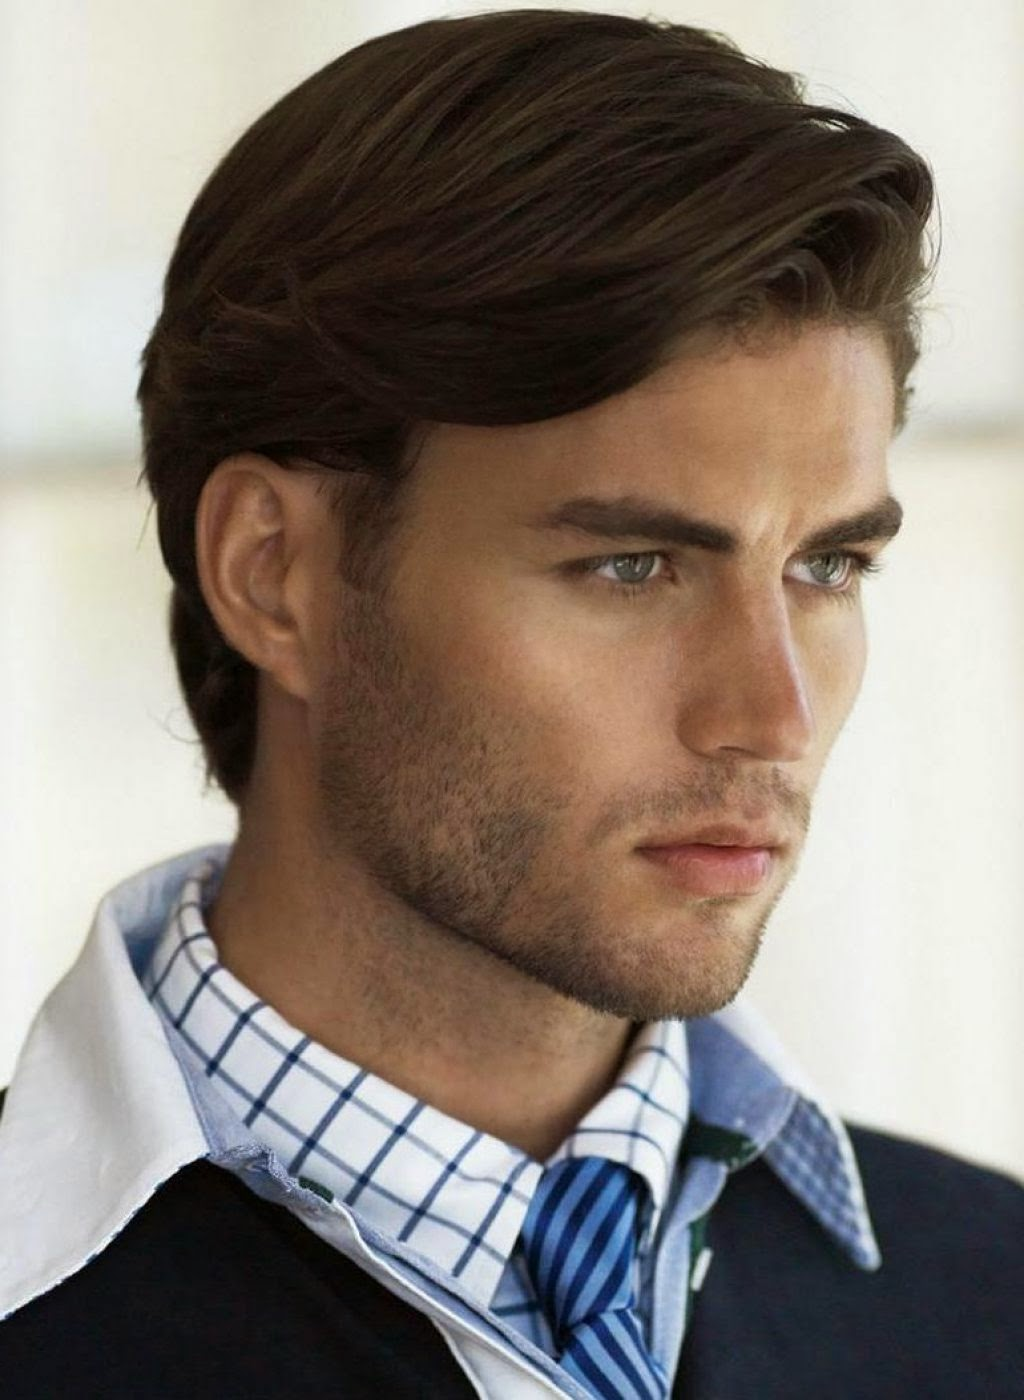 Más inspirador peinados hombre pelo medio largo Fotos de estilo de color de pelo - peinados hombre pelo medio | Elainacortez